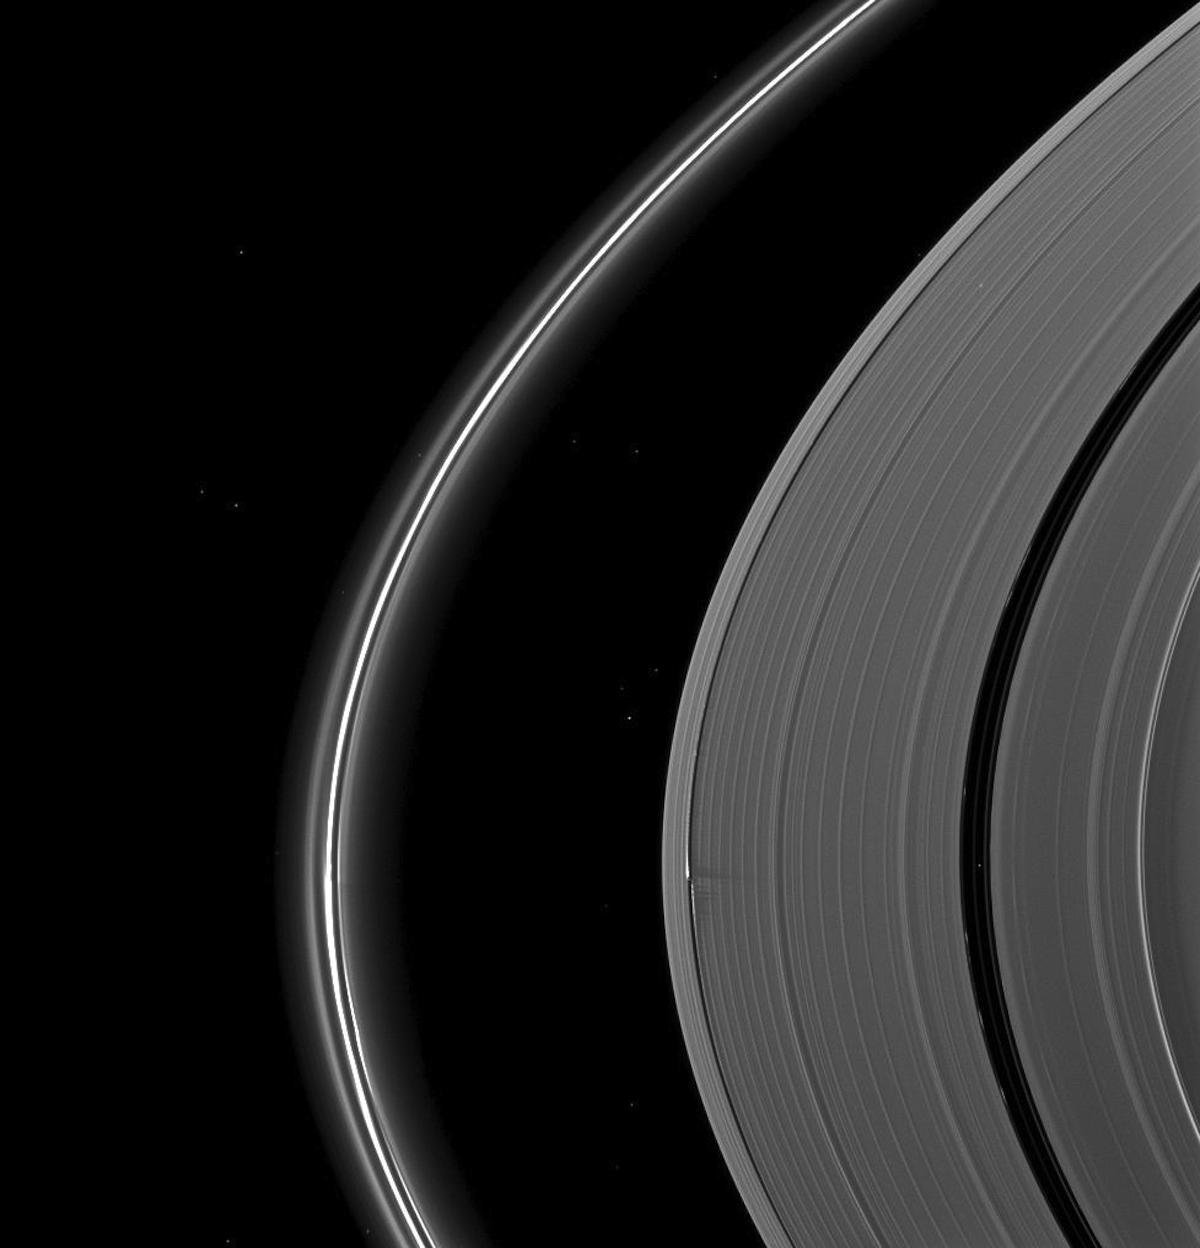 imagenes nunca vistas de saturno tomadas por la sonda cassini 15